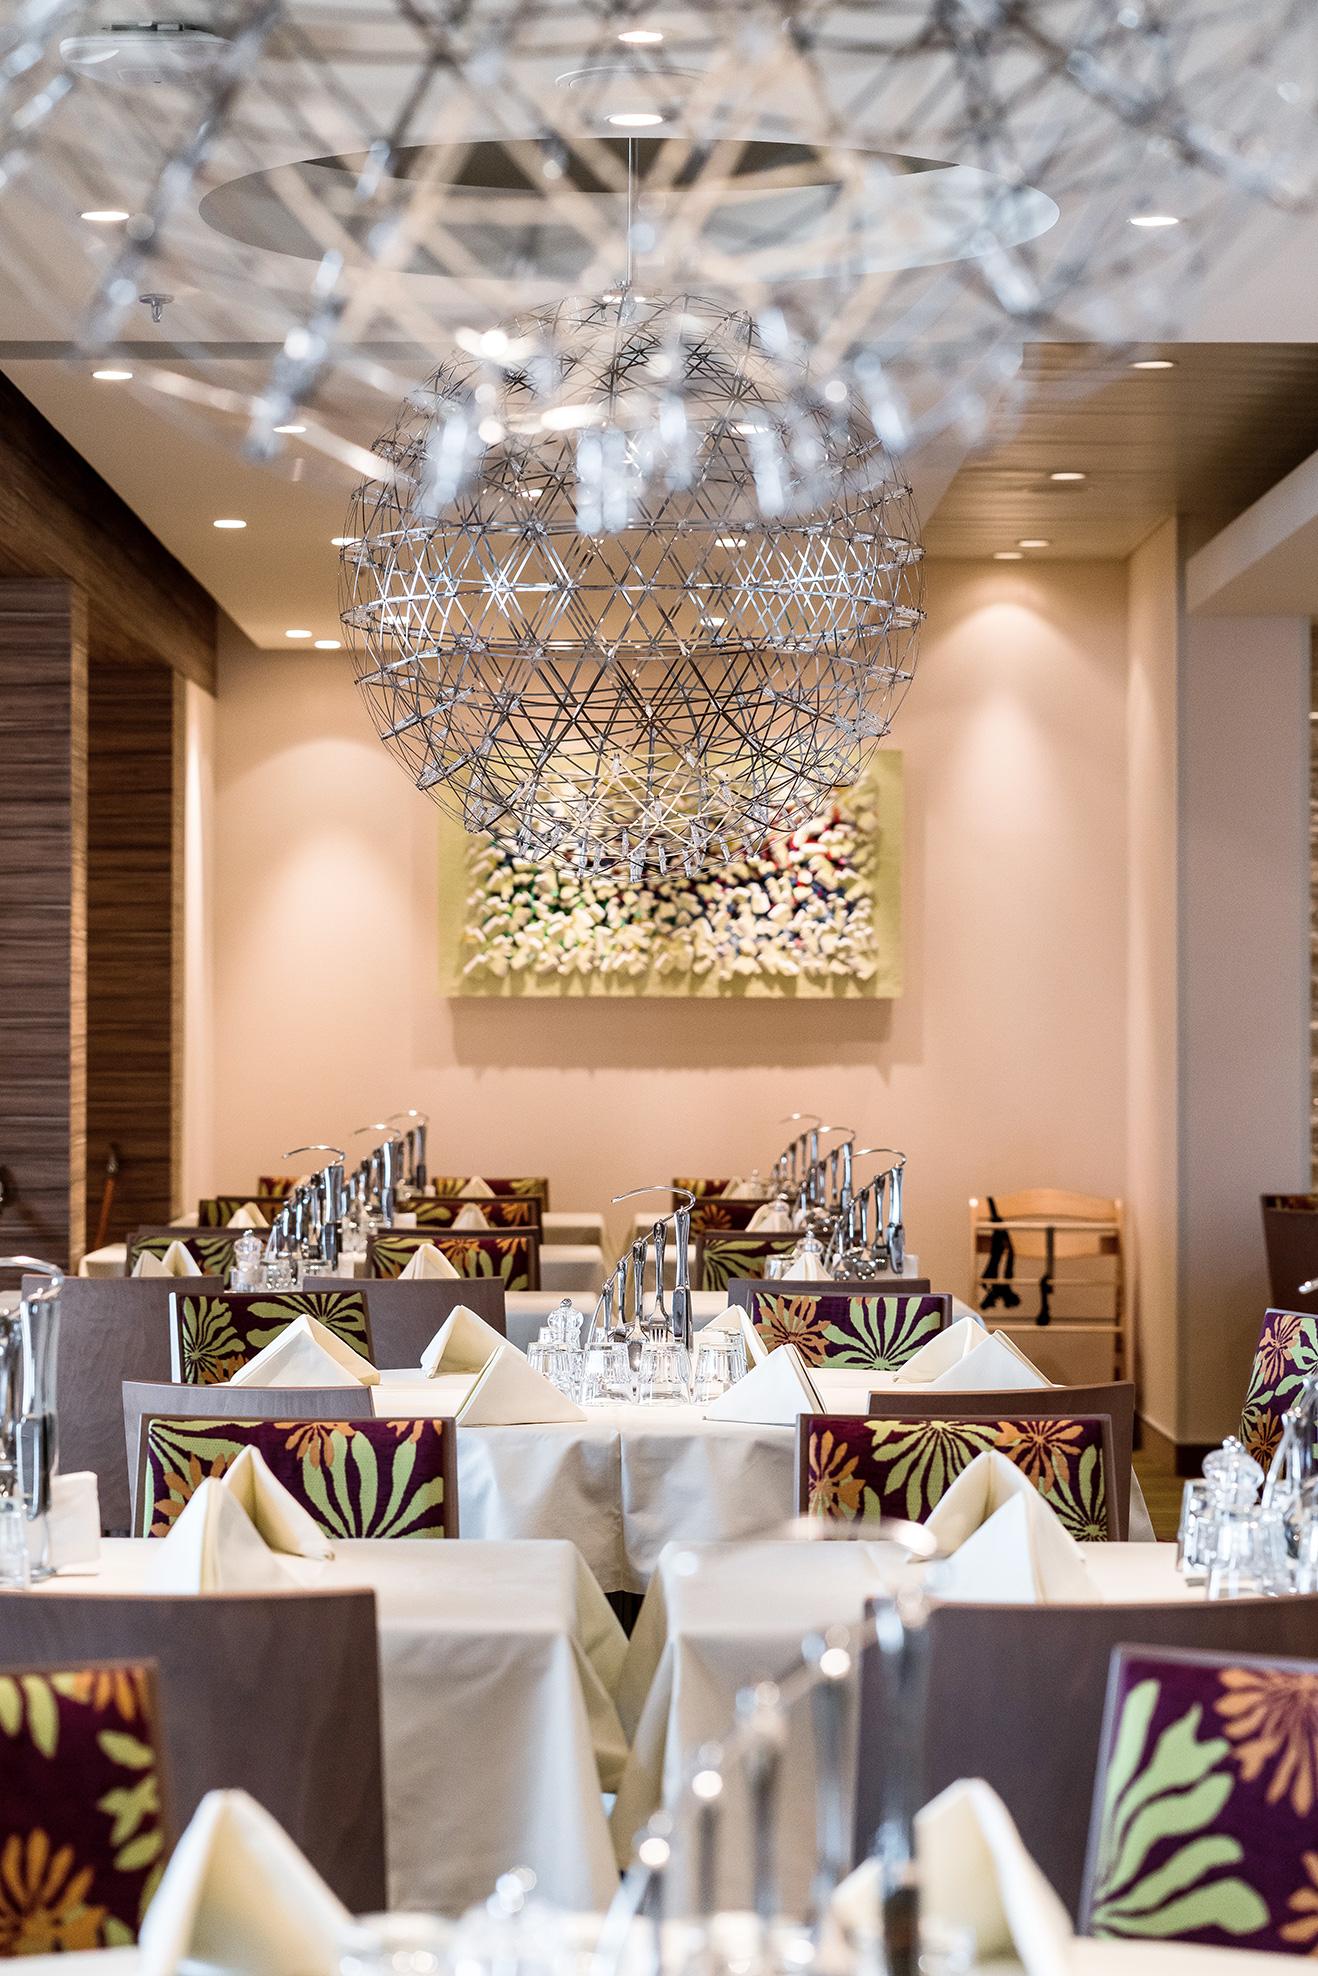 AC_036759_East_Restaurant